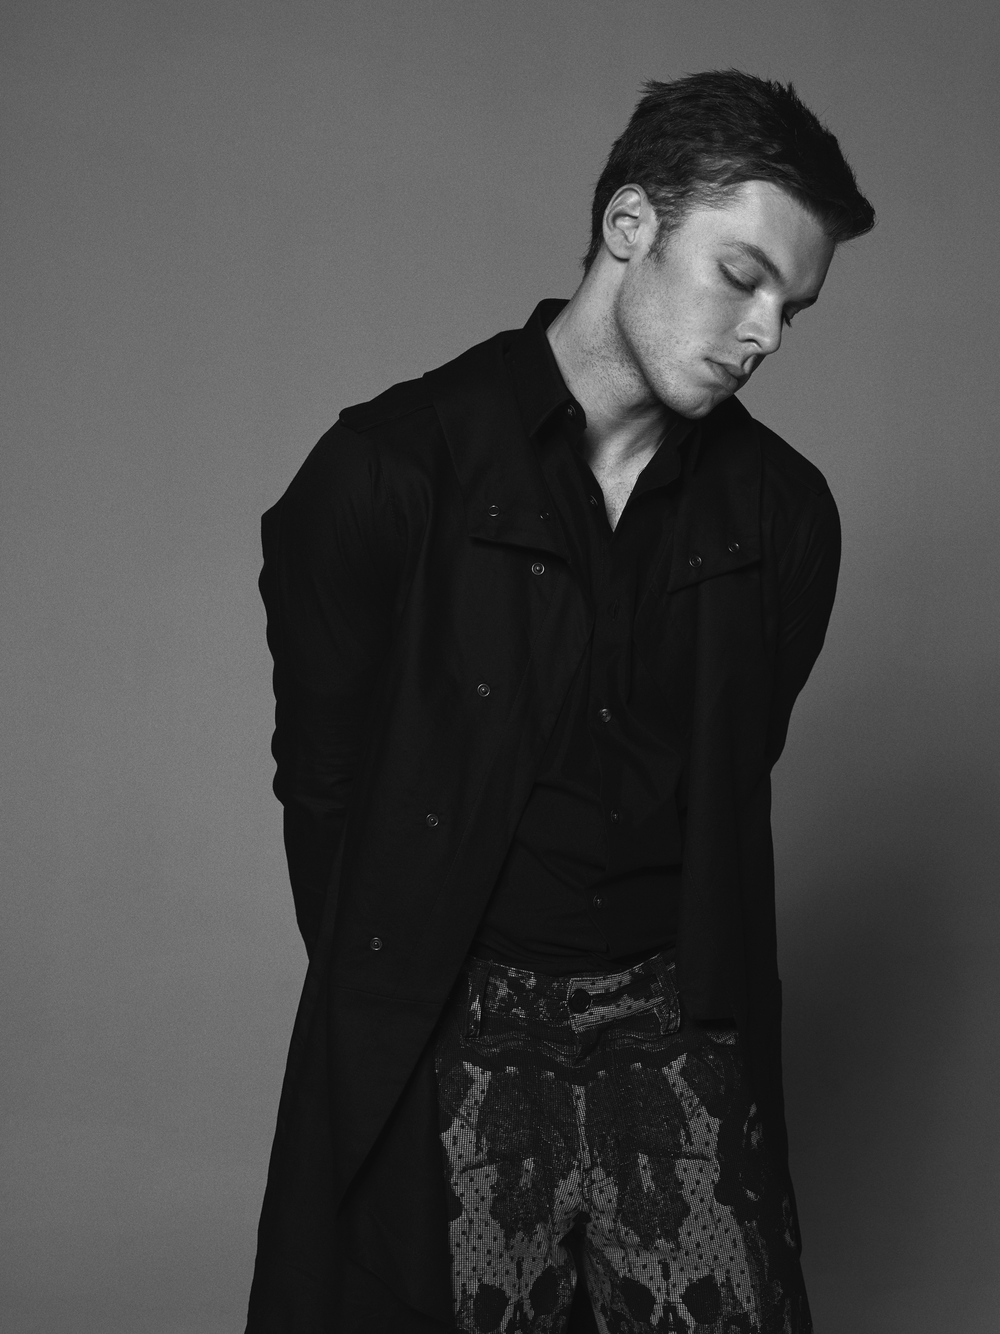 Jacket: UMASAN / Shirt: Calvin Klein / Pants: Mister Triple X